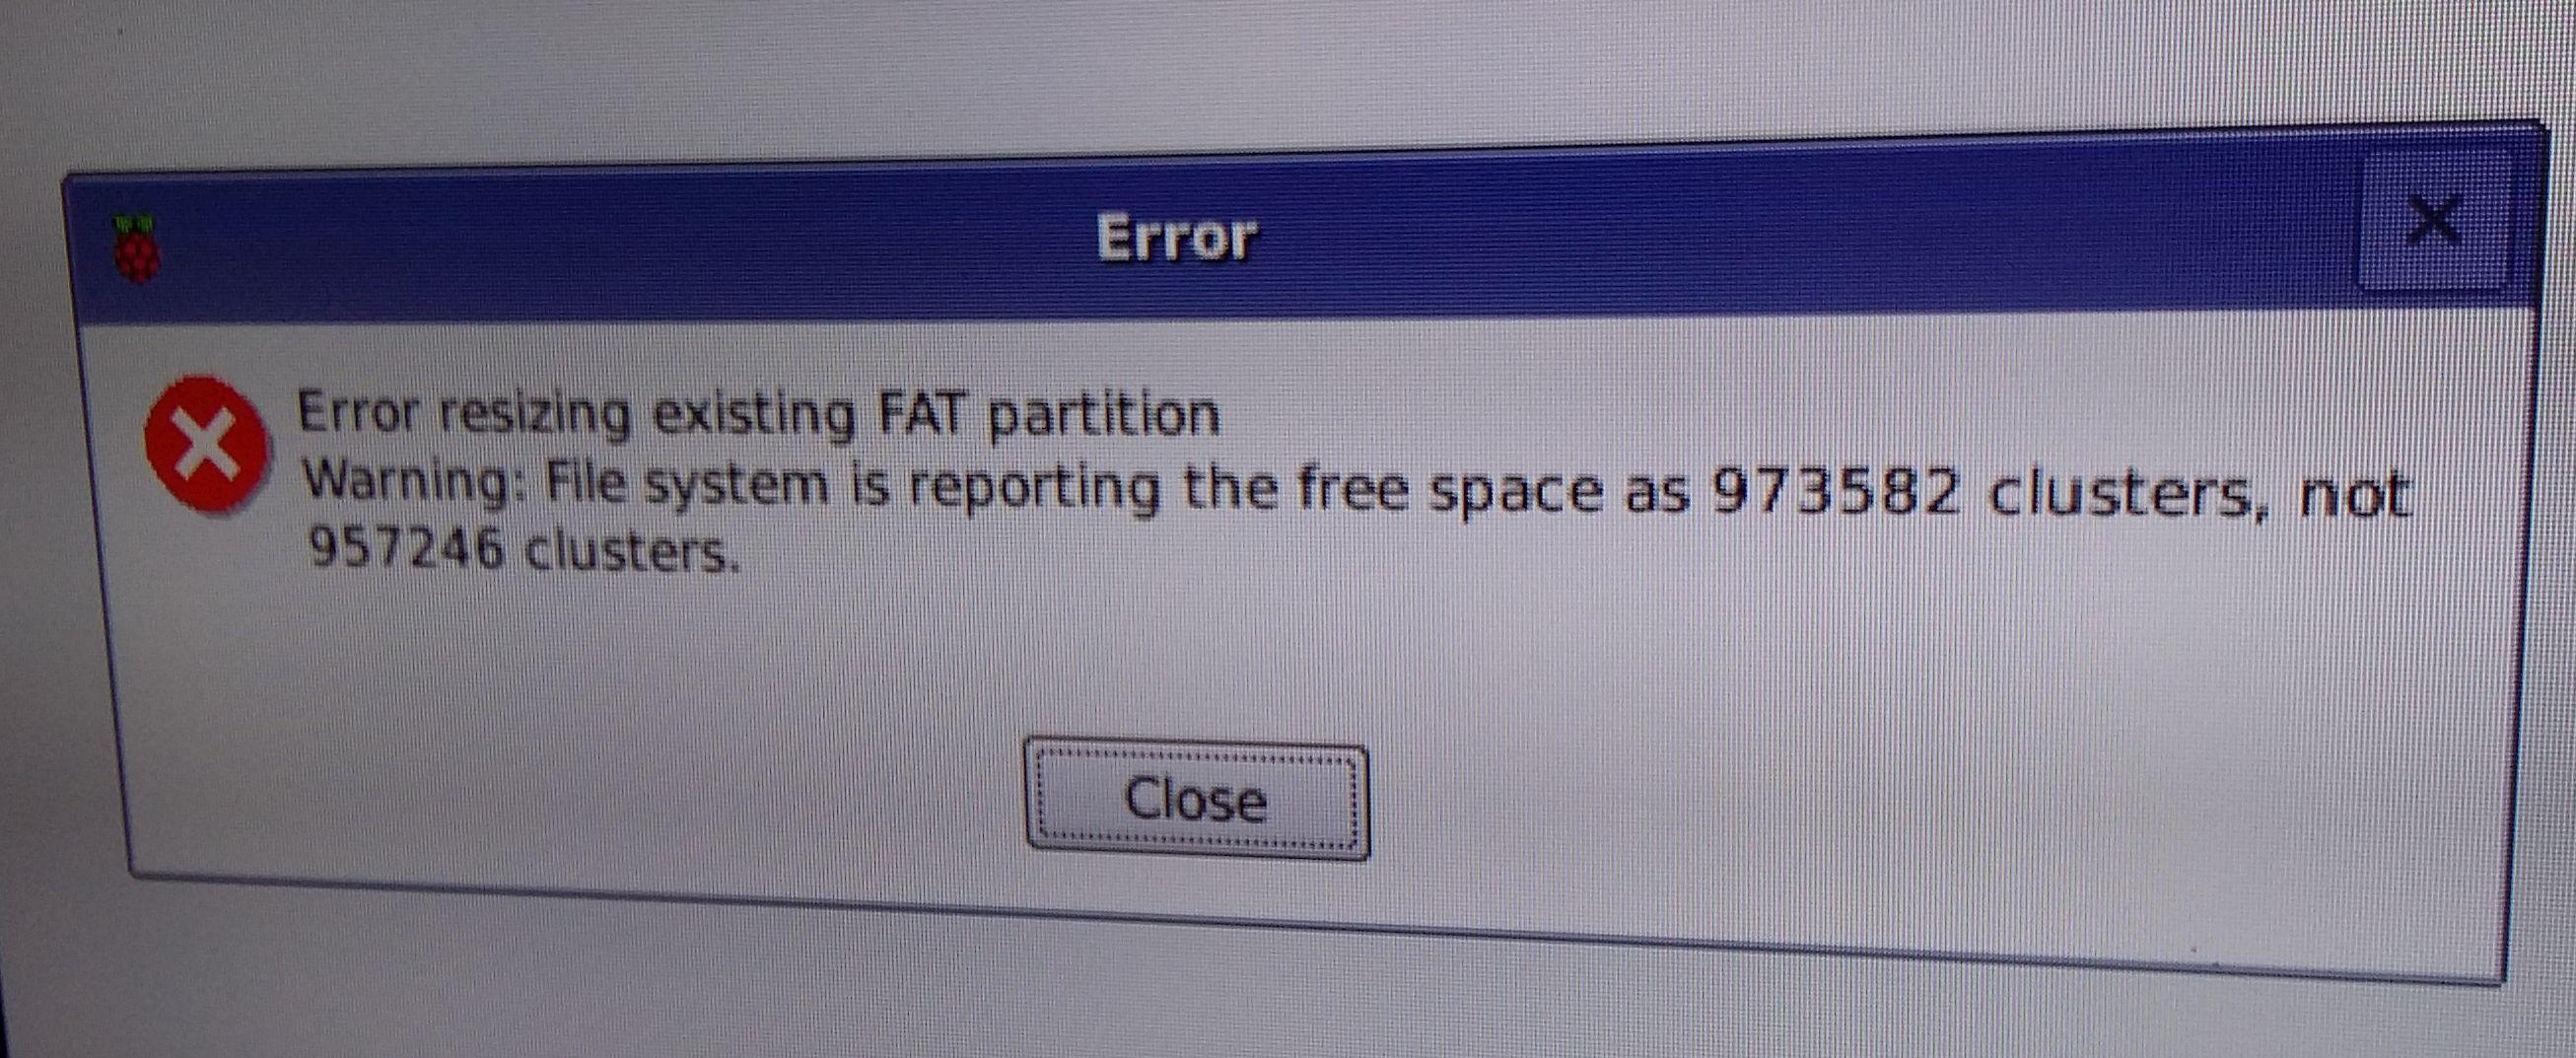 0_1474828670817_ERROR FAT Partition.jpg